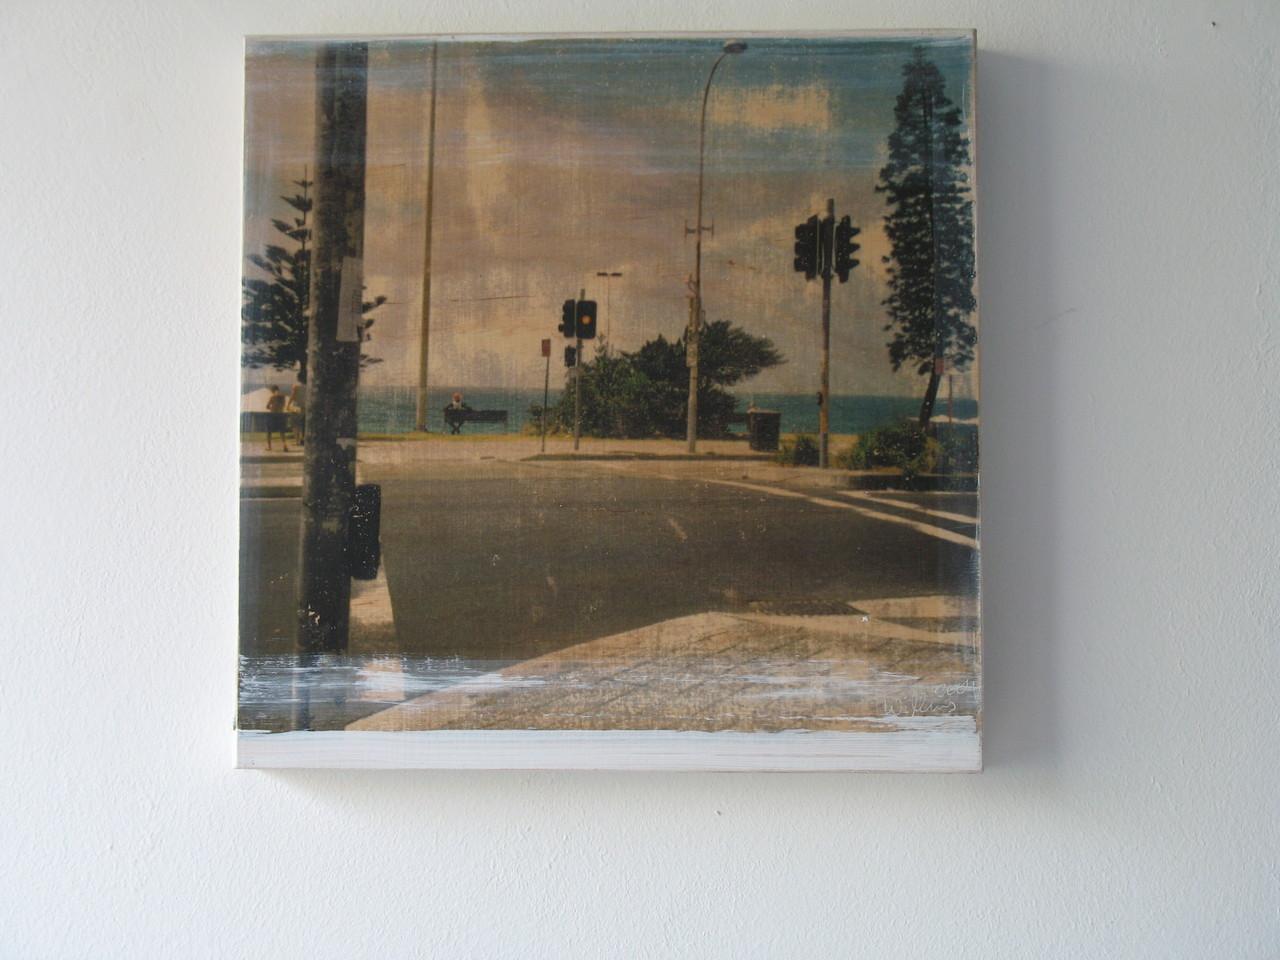 Ampel vor Bondi Beach, 1/7 2004 30x30 cm verkauft